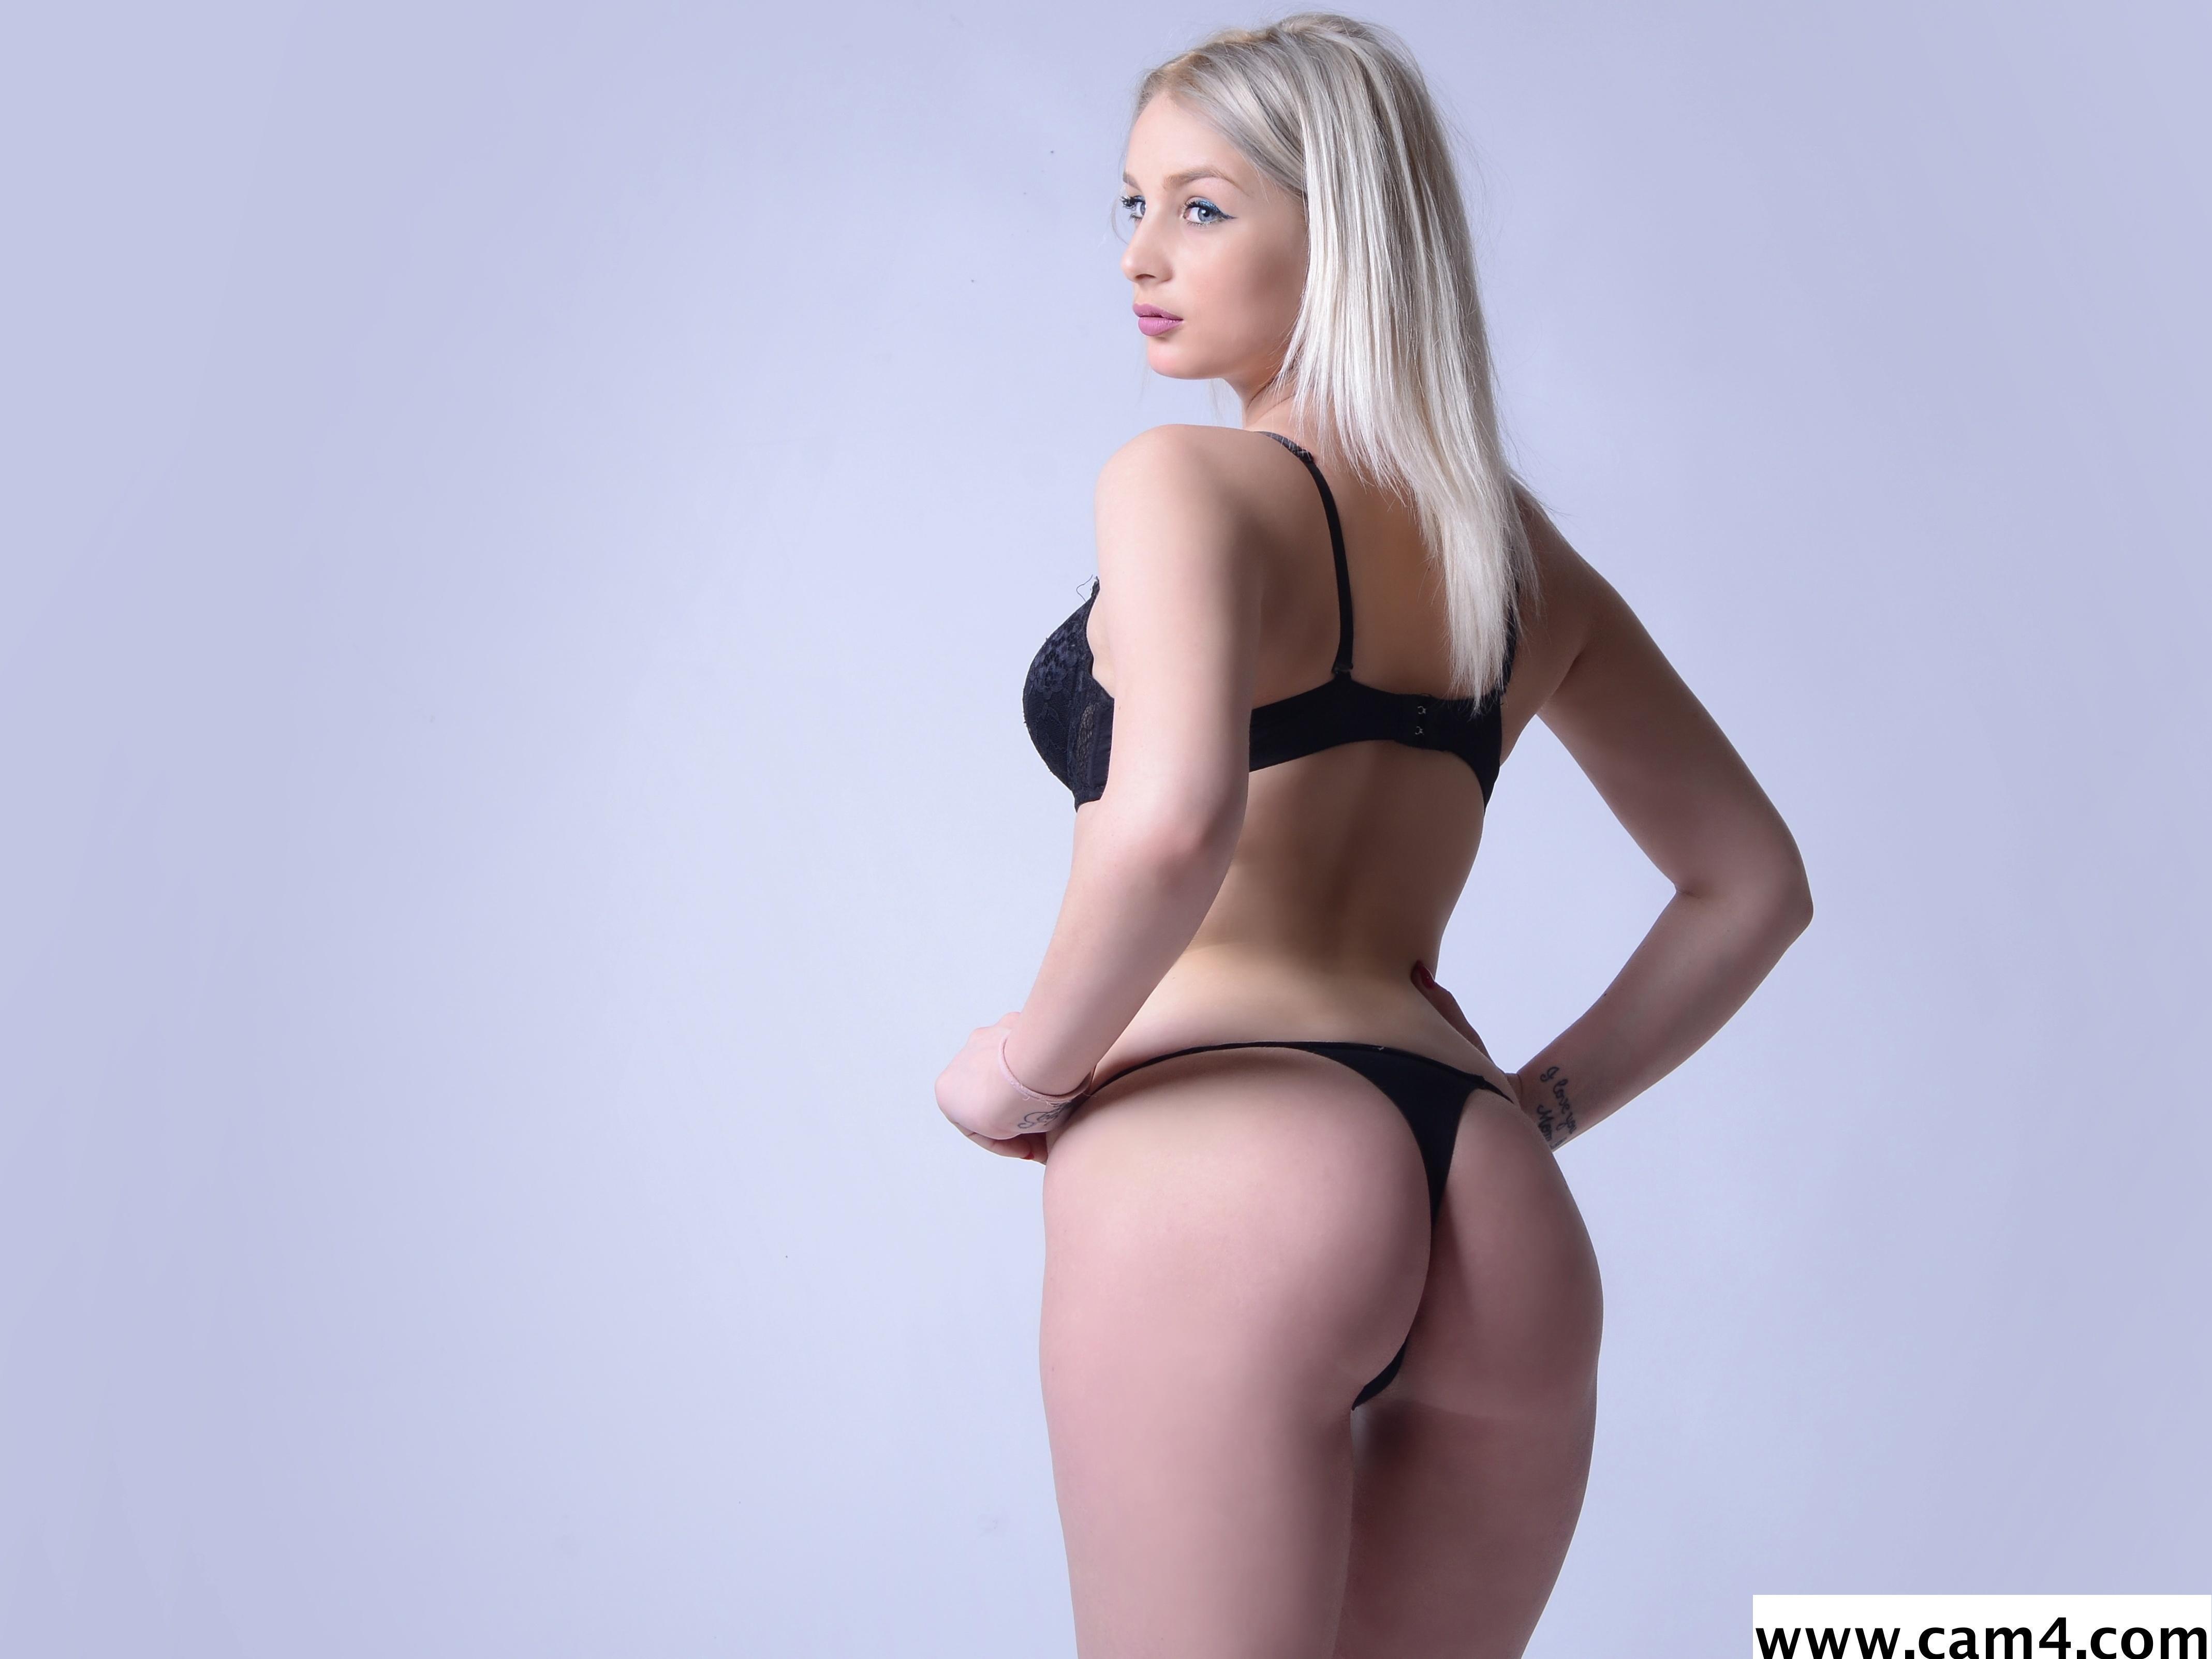 sexyblonde2u photo 12723889